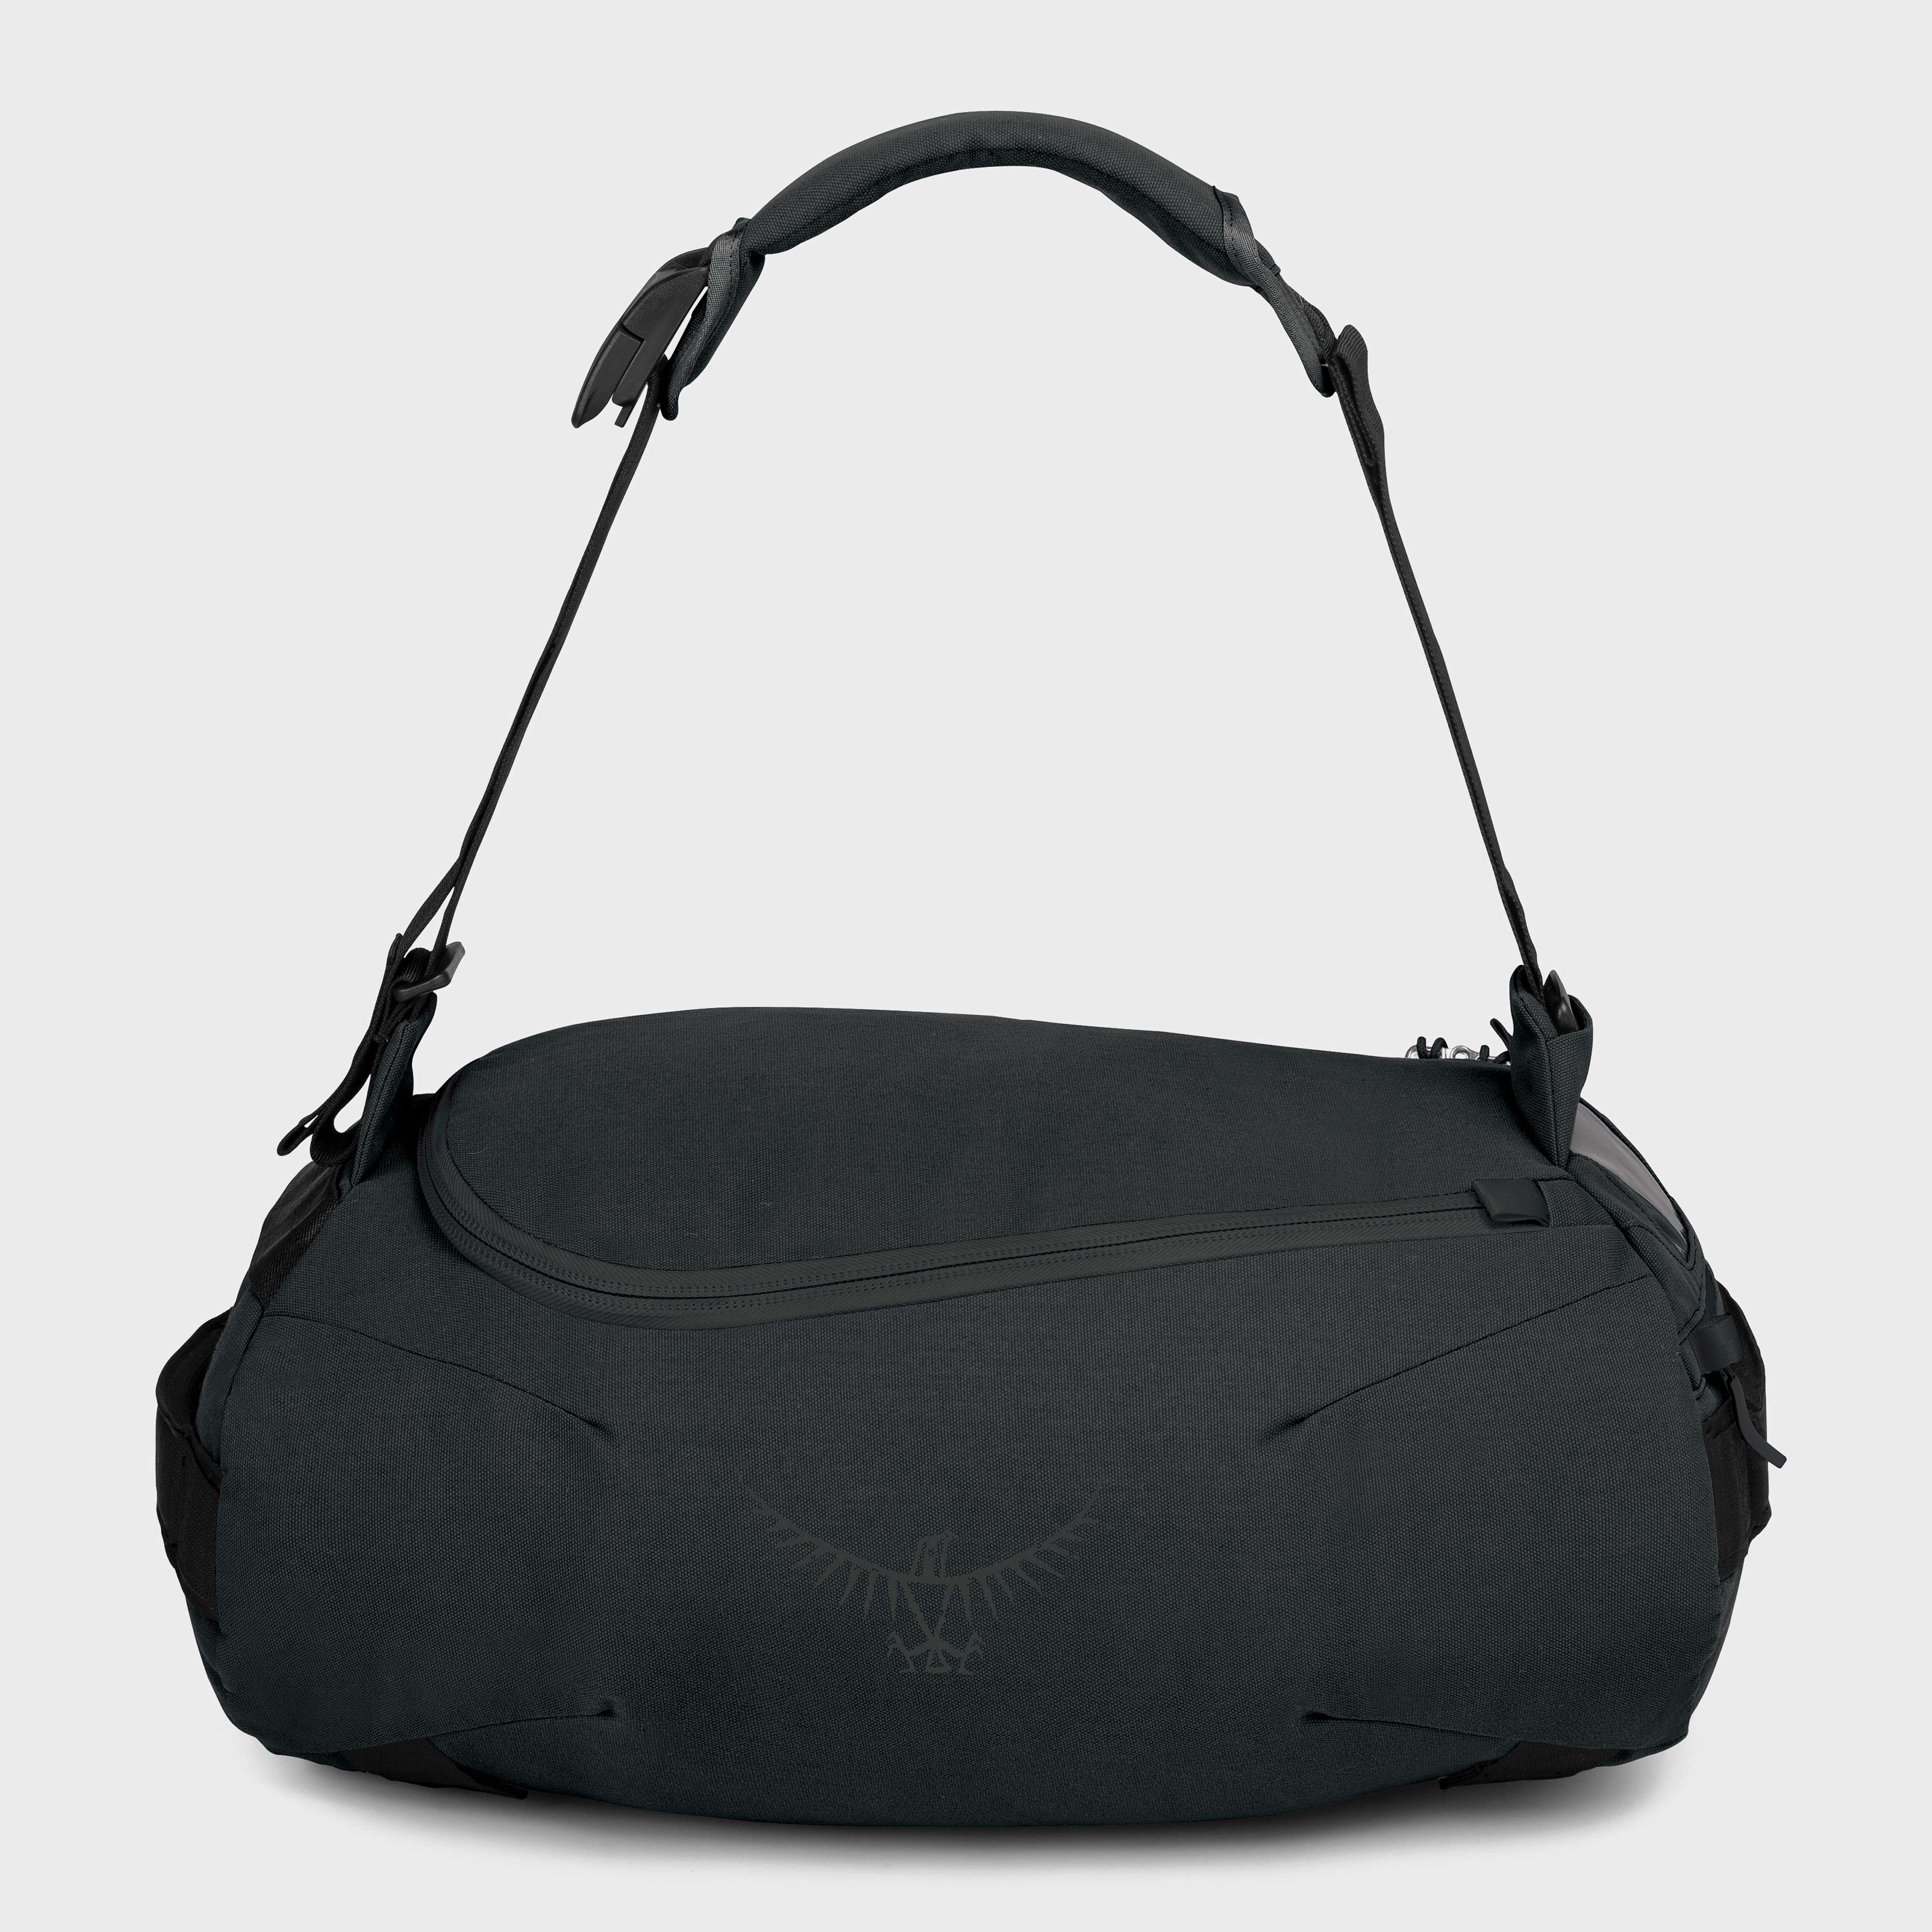 OSPREY Trillium 30 Litre Duffel Bag